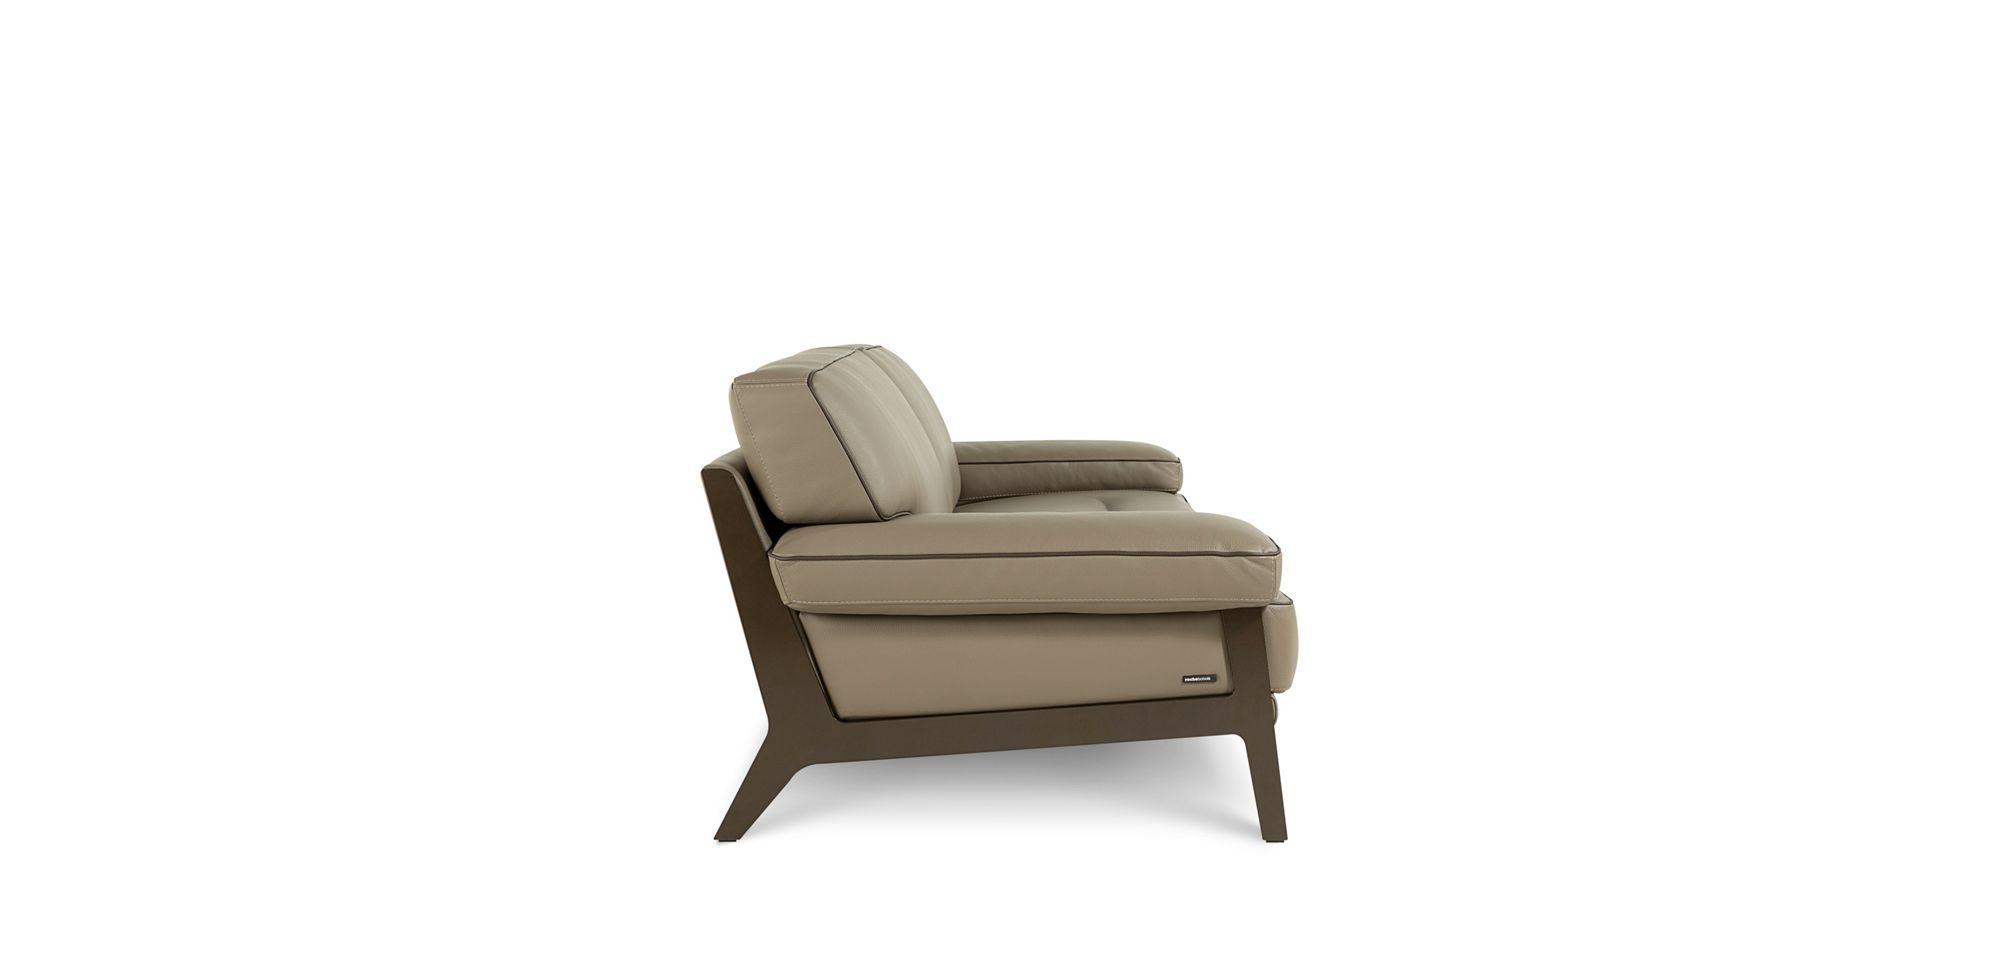 Latitude Large 3 Seat Sofa Sofas Sofa Beds Roche Bobois